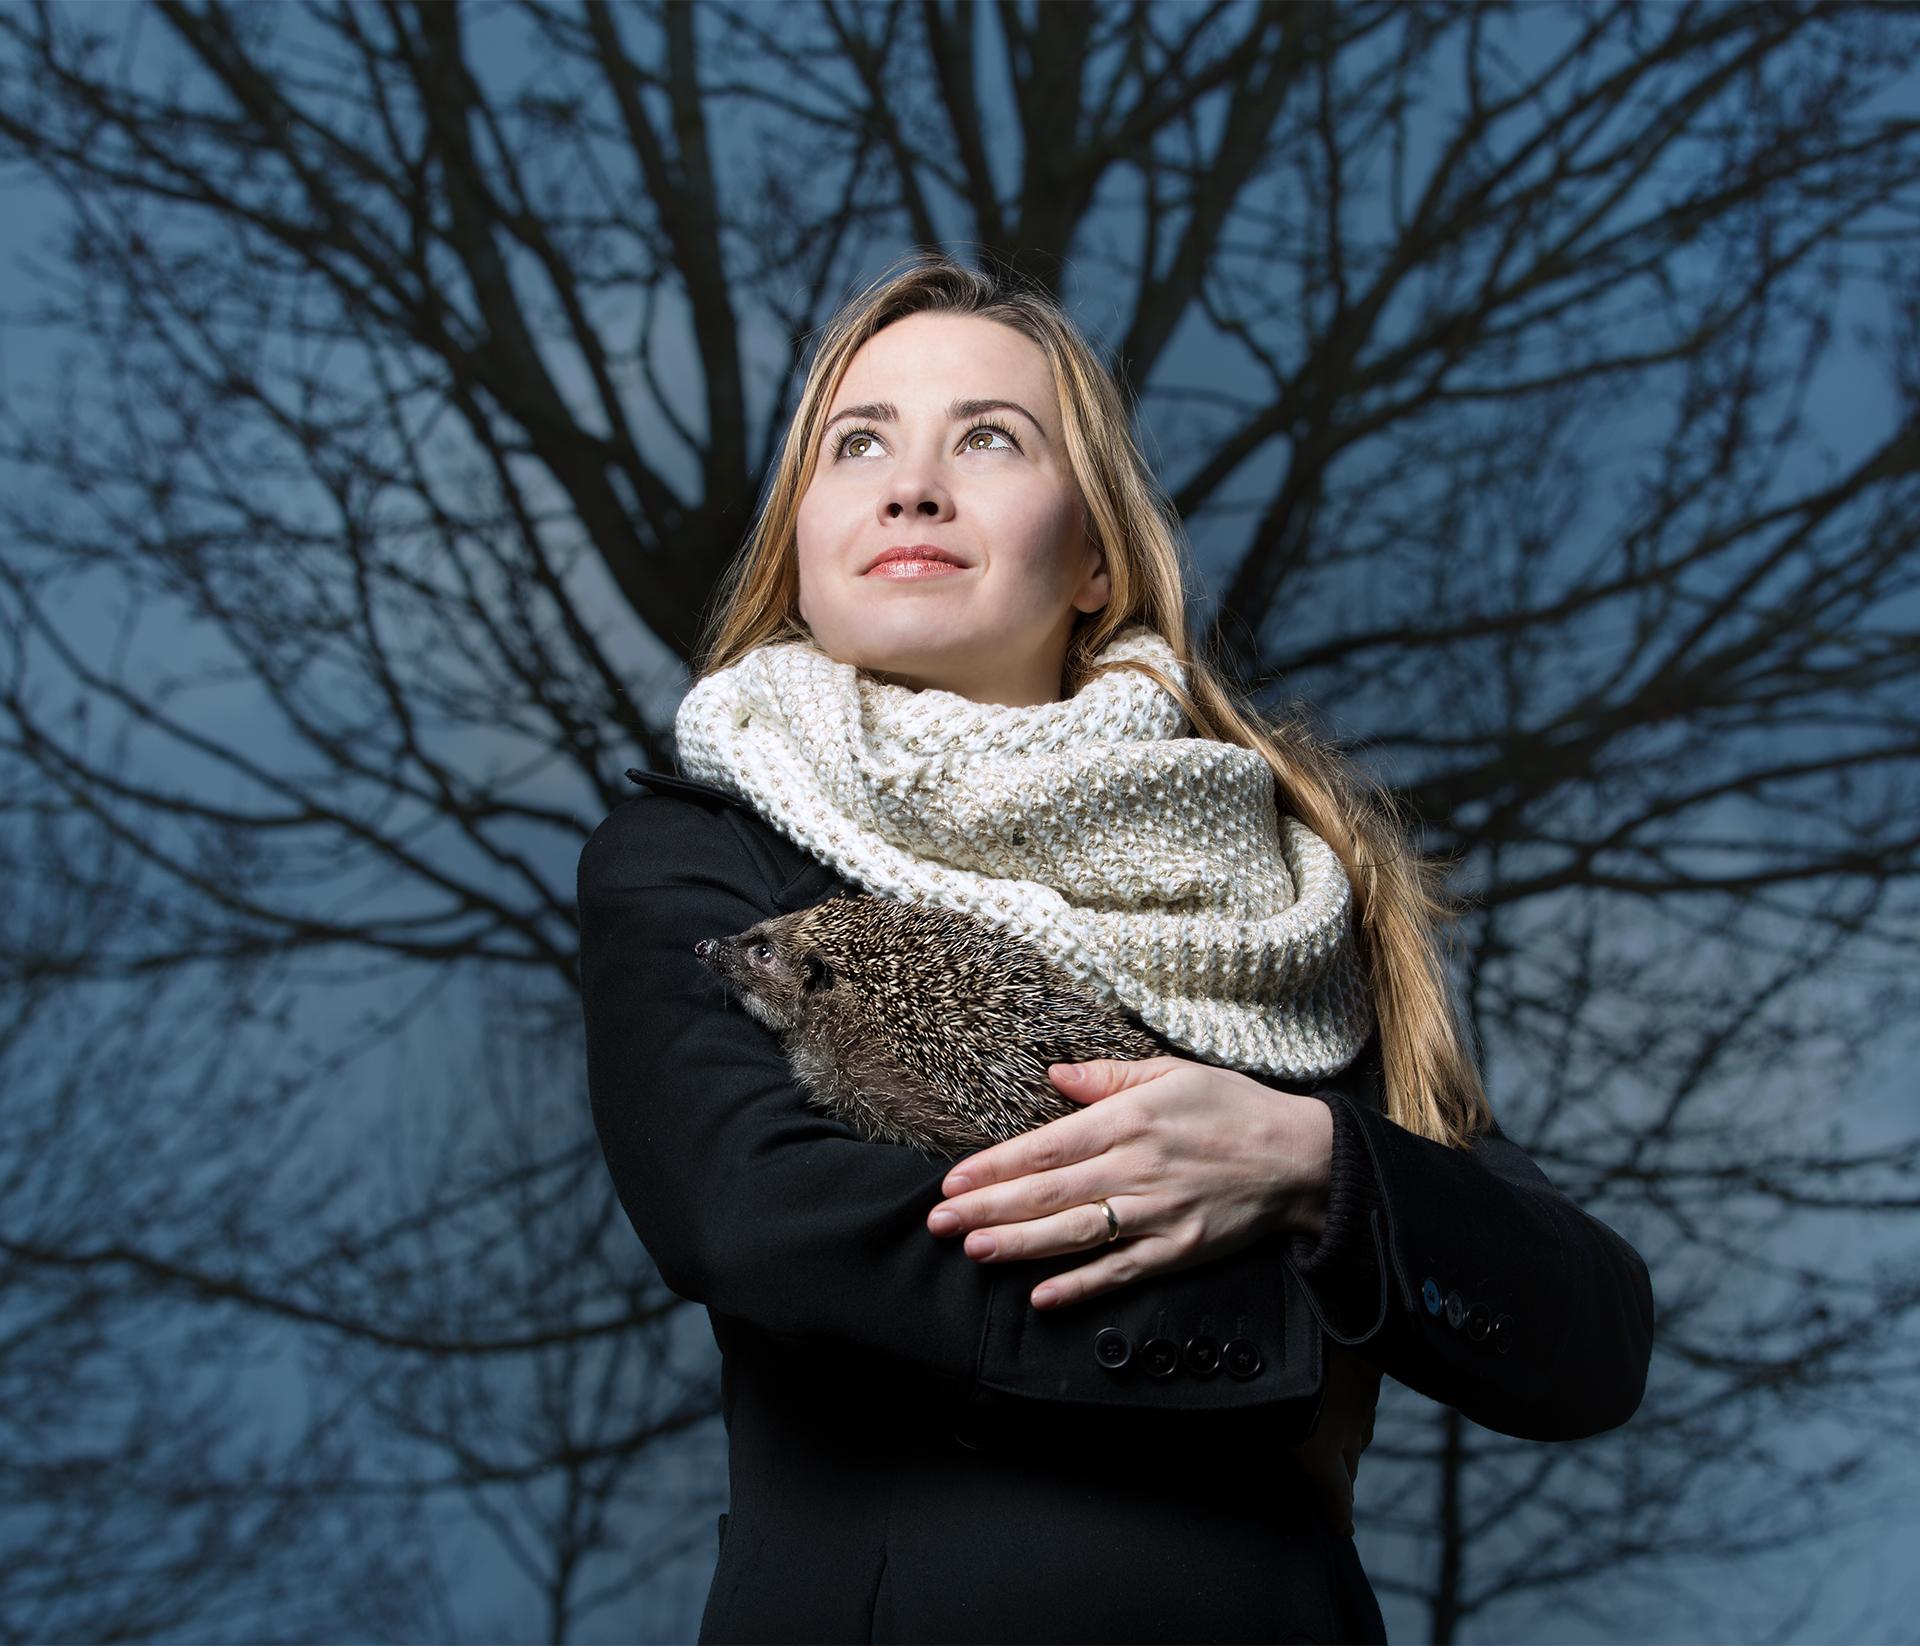 Joanna Bagniewska / Zoologist.